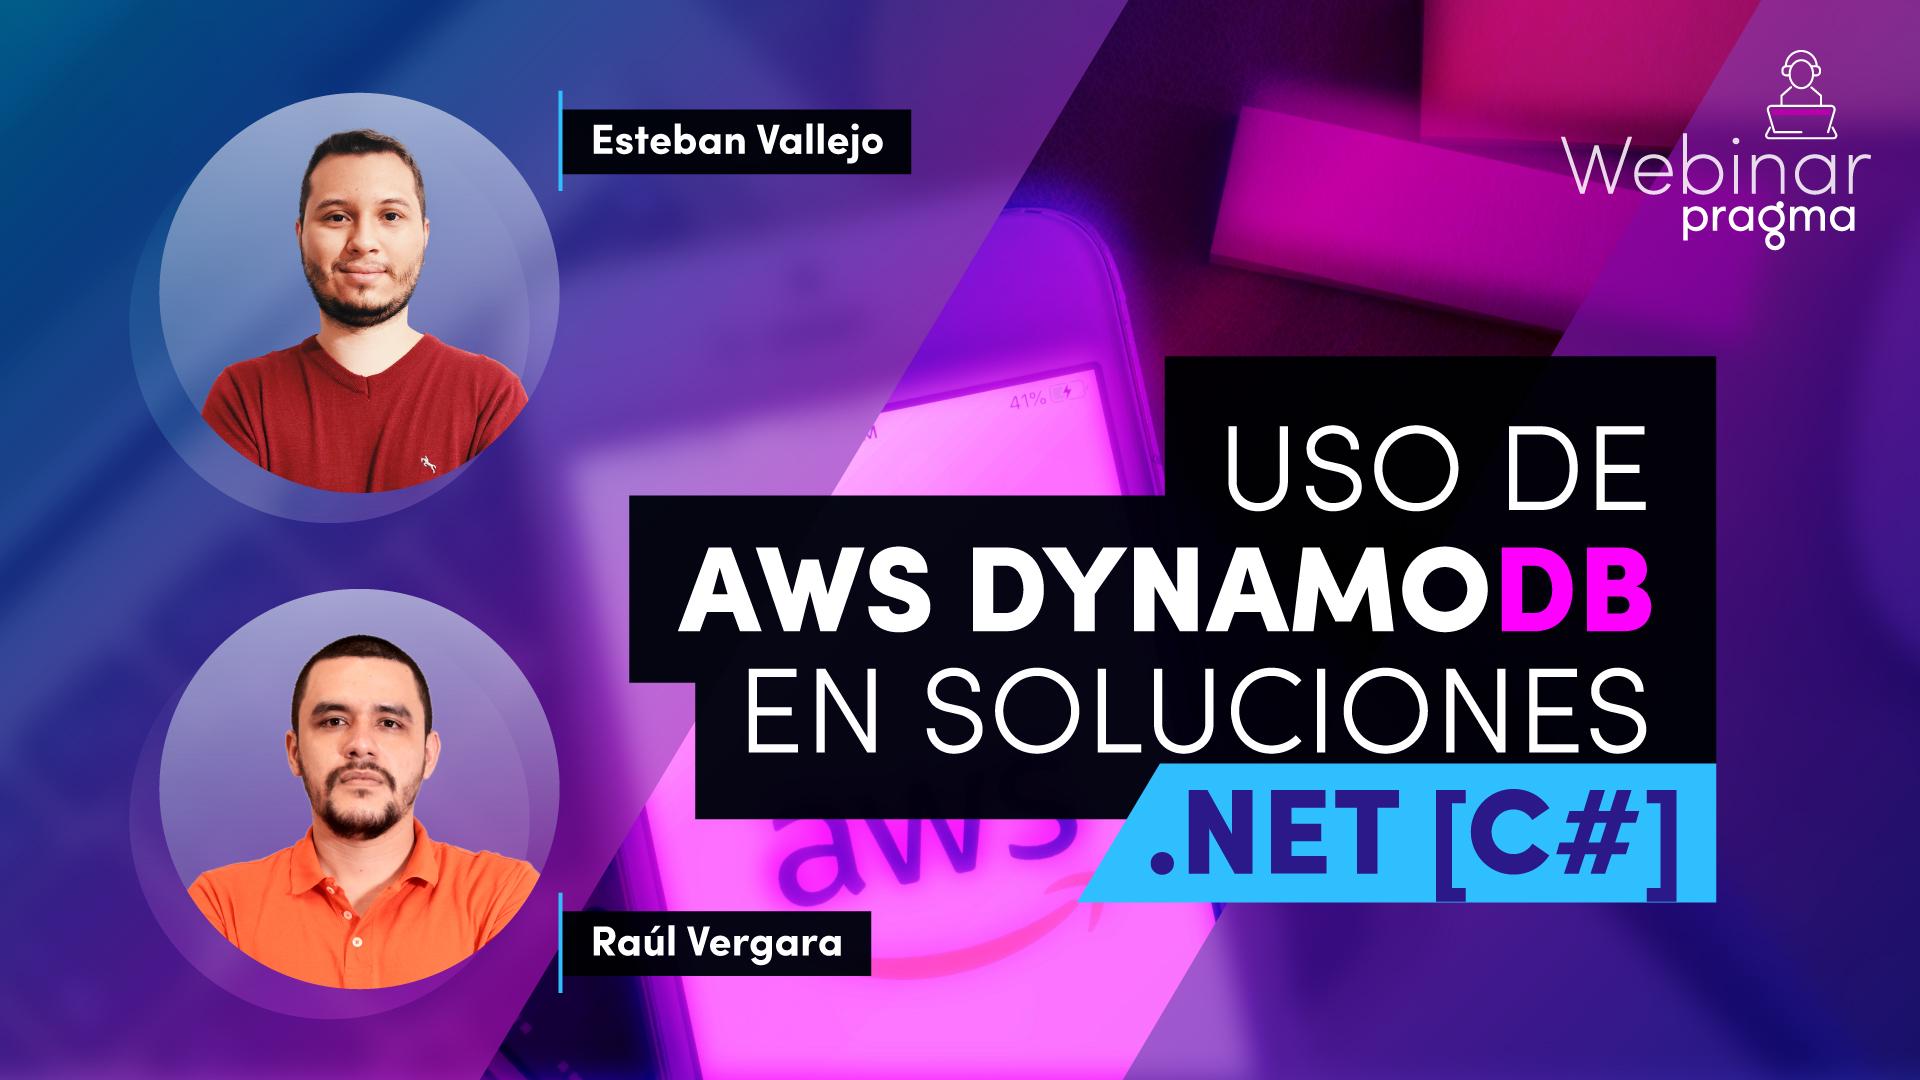 BANNER_ACADEMIAUso-de-AWS-DynamoDb-en-Soluciones-.Net-[C#],-Webinars---Academia-Pragma